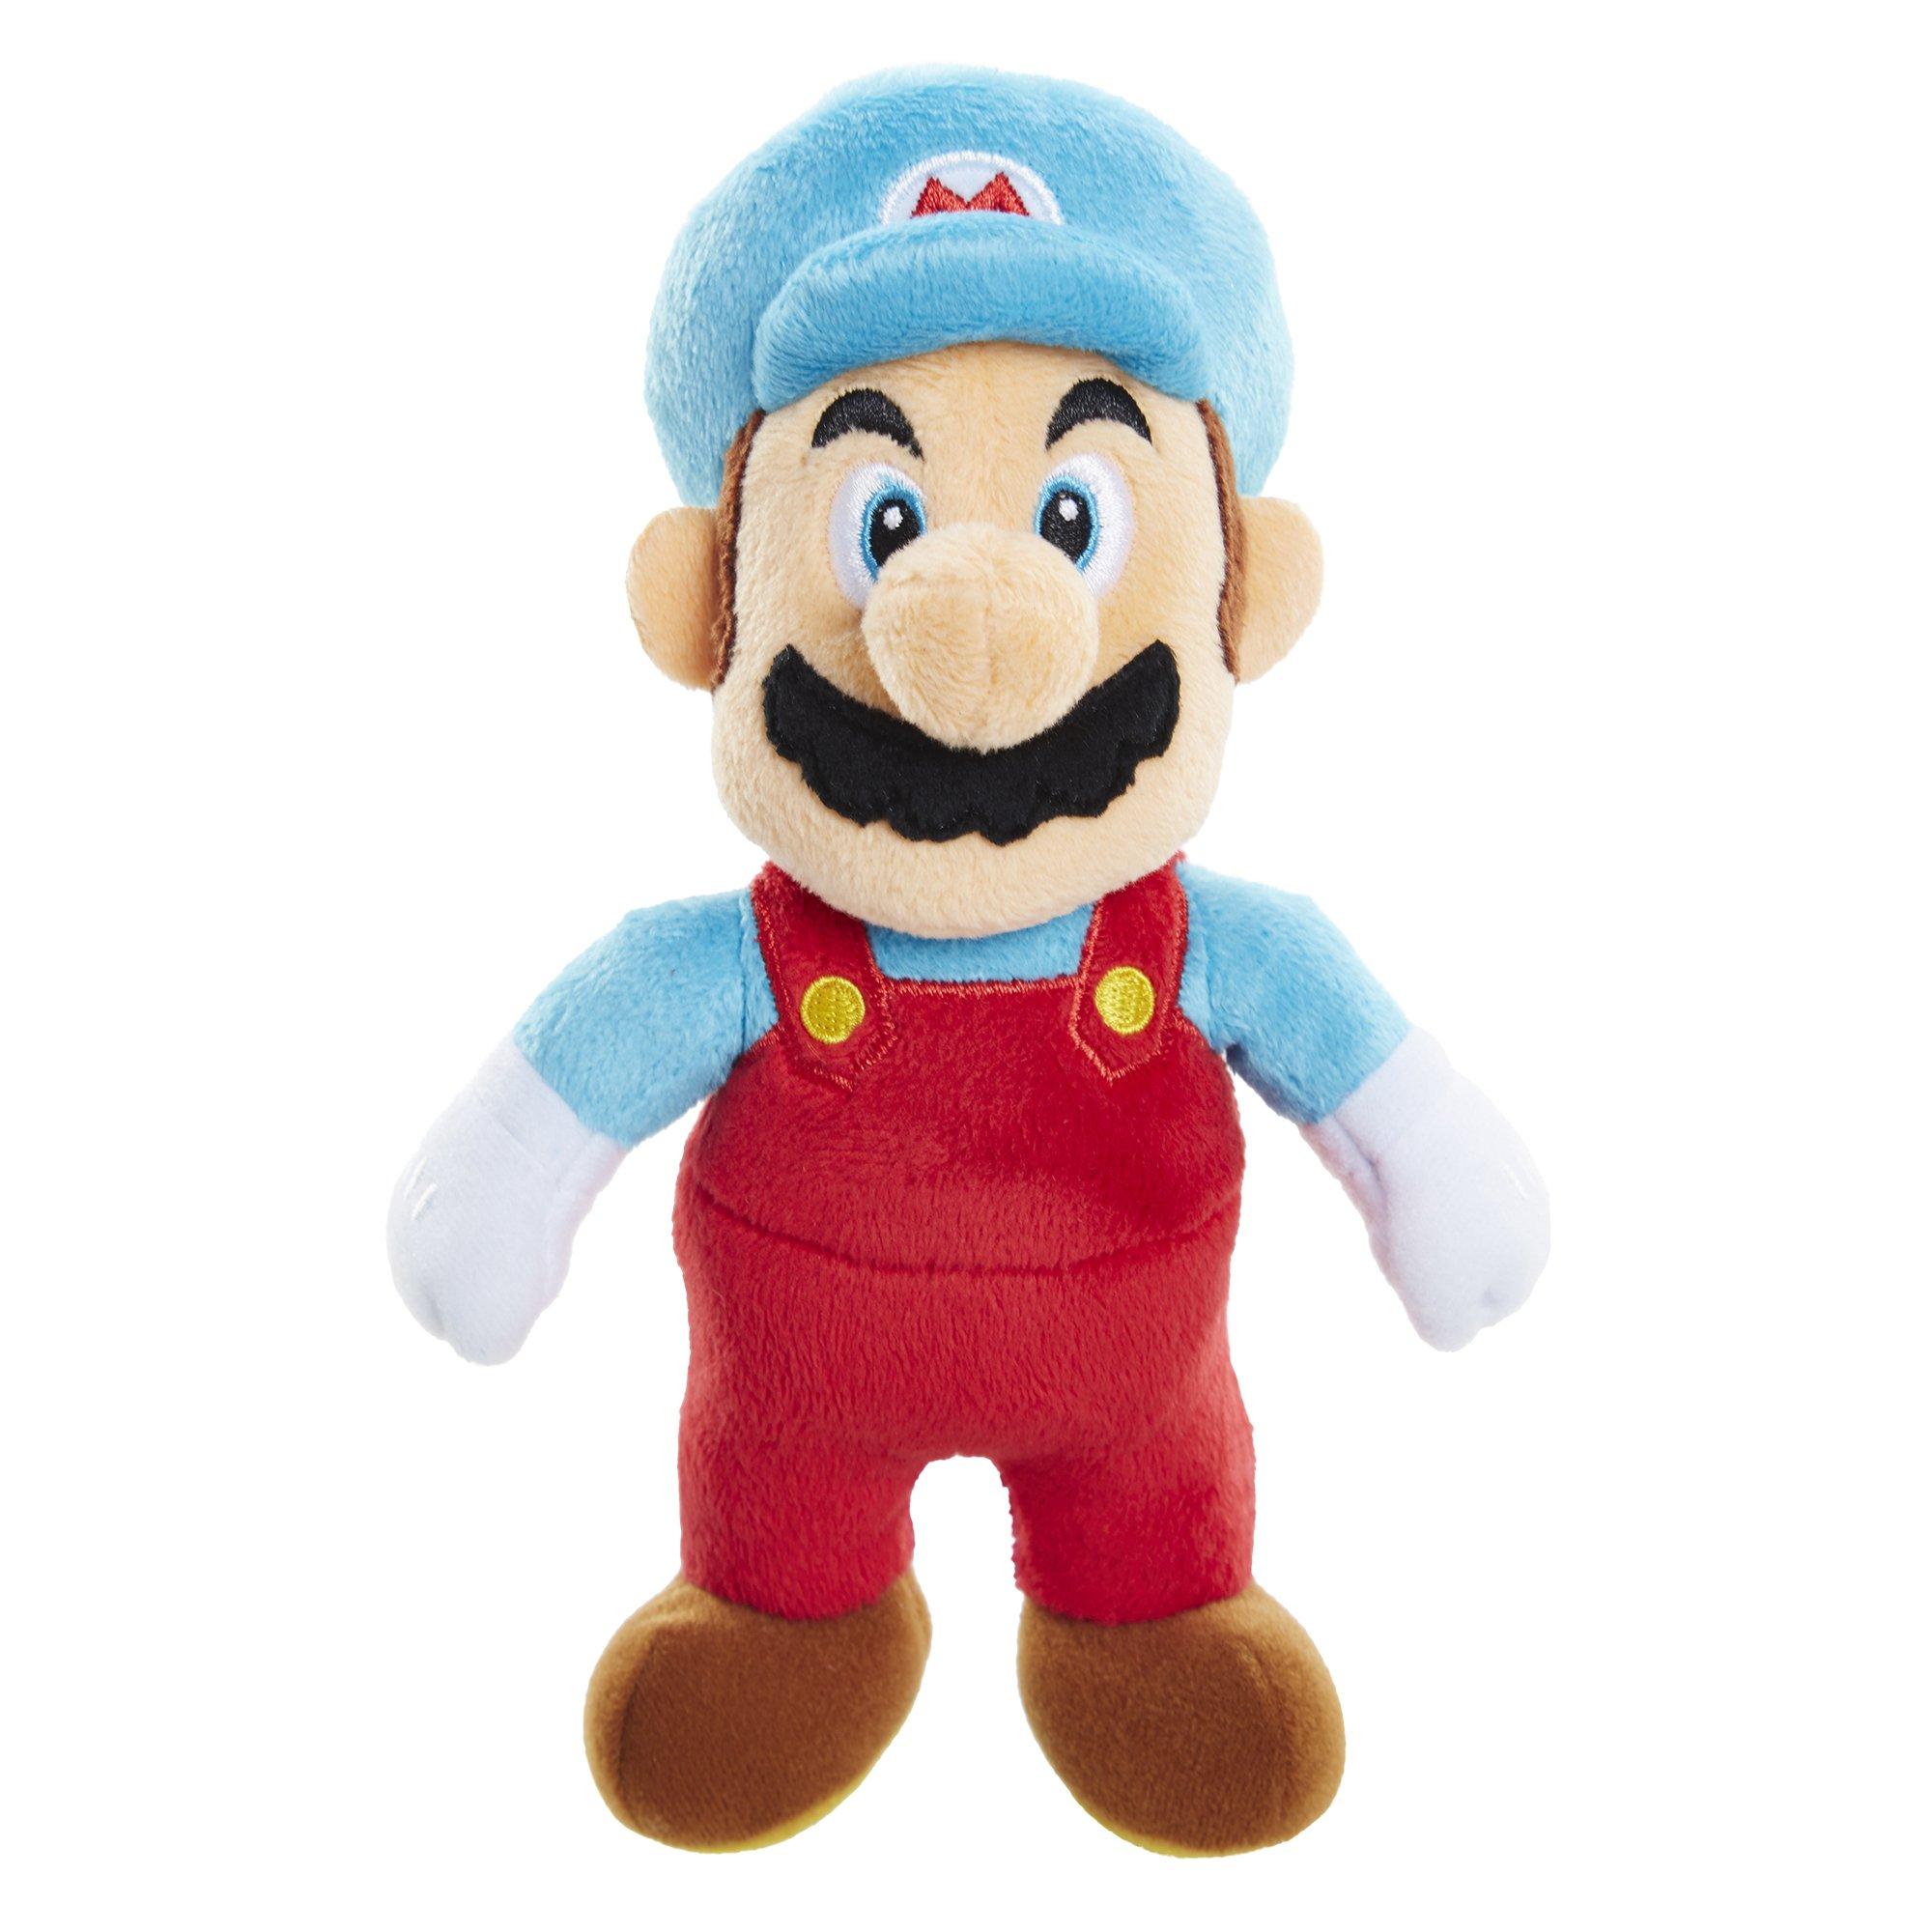 NINTENDO World of Nintendo Ice Mario Plush